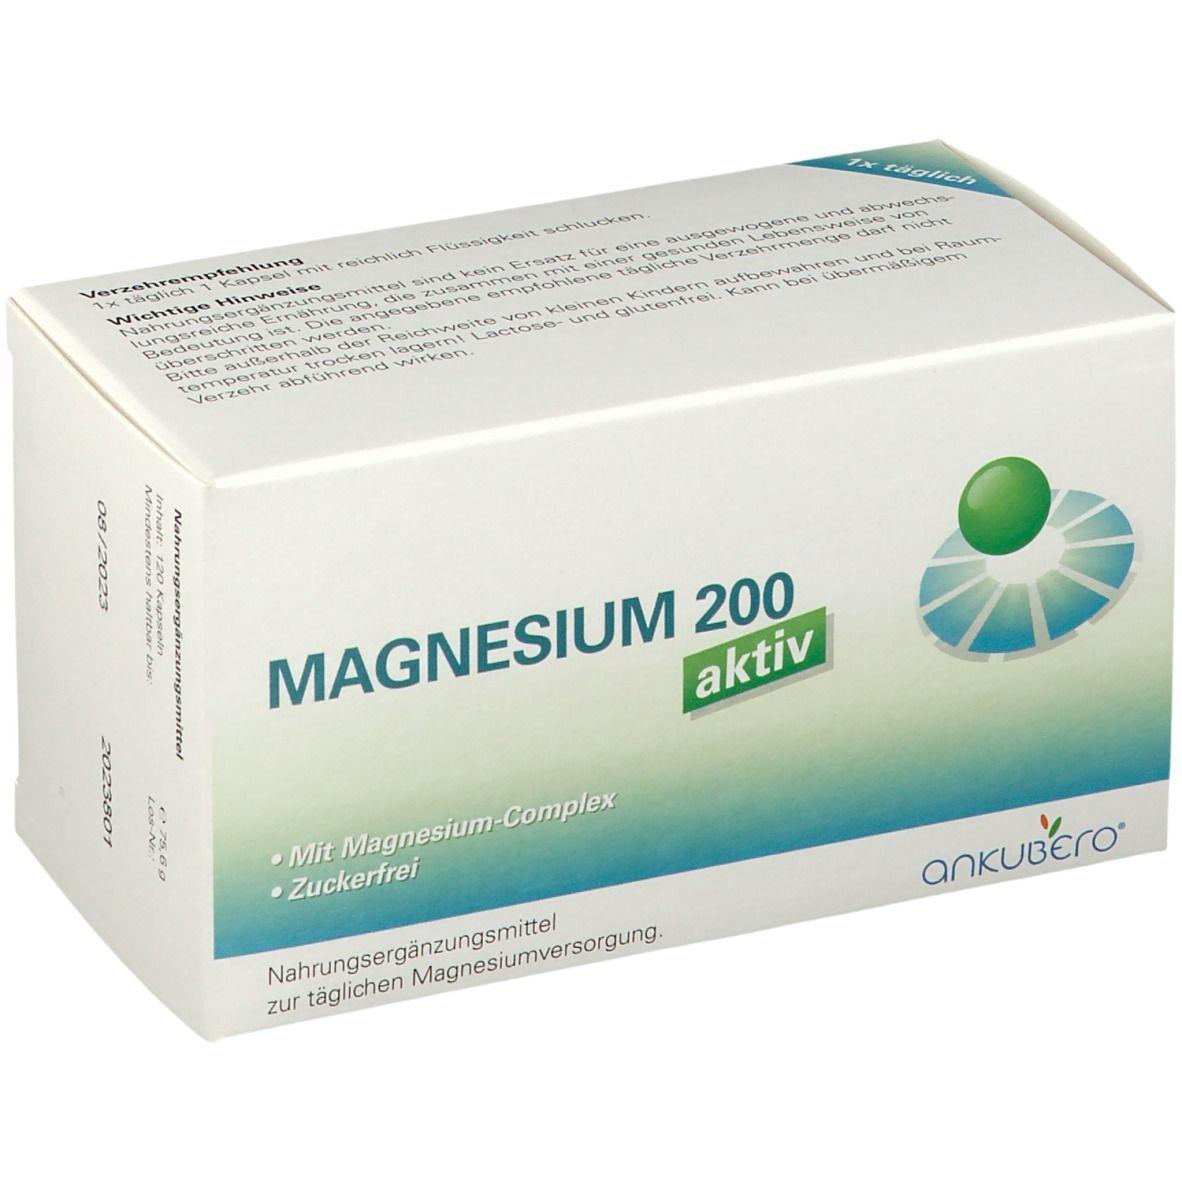 Image of Magnesium 200 aktiv